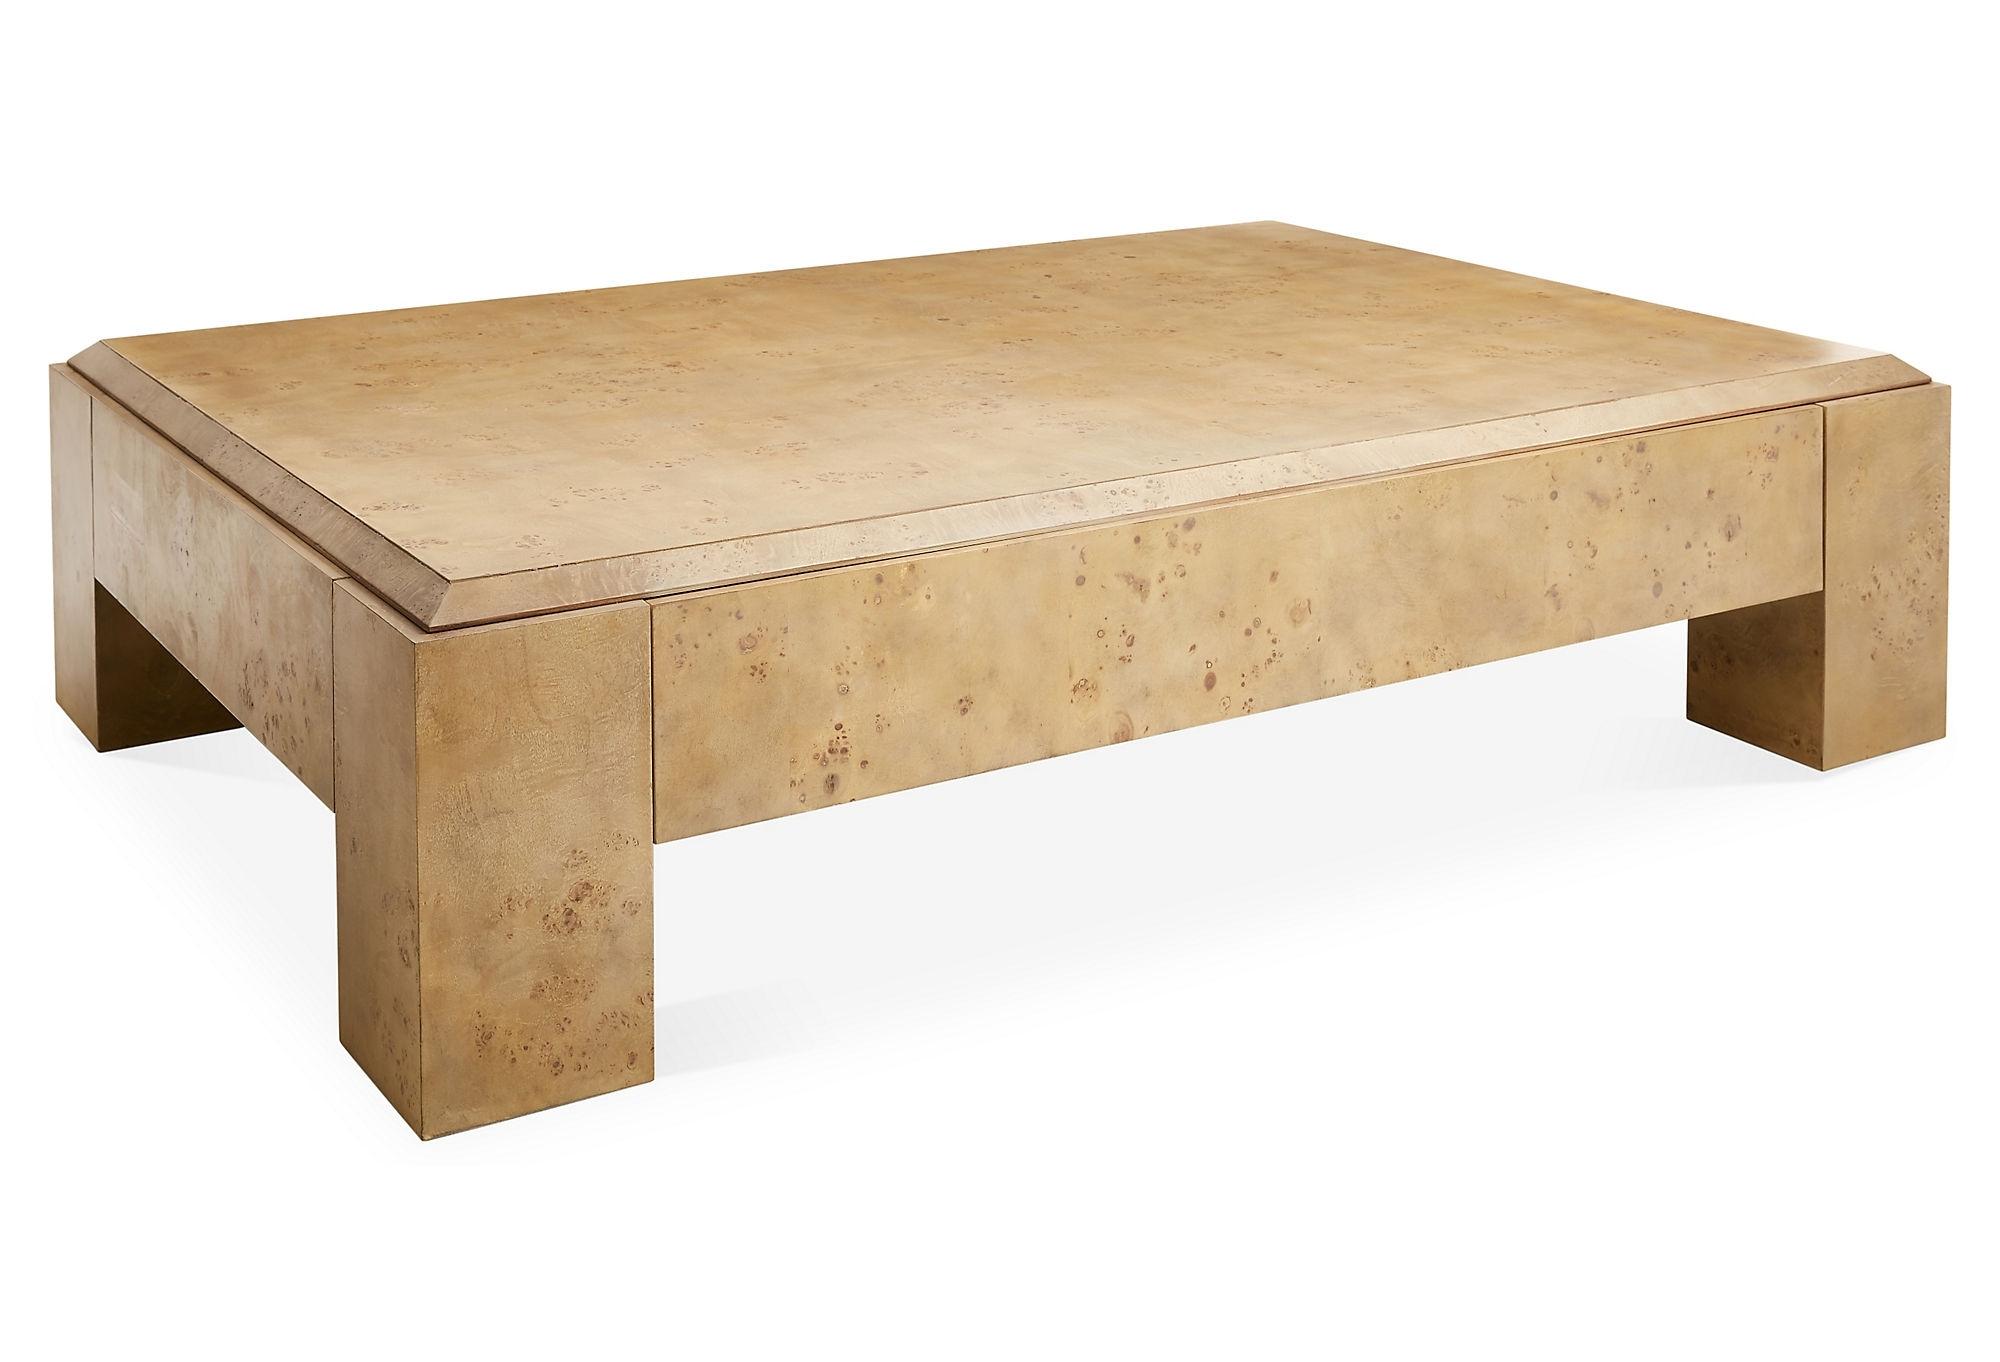 Lovely Burled Wood Coffee Table - Sarjaopas | Sarjaopas for Joni Brass and Wood Coffee Tables (Image 21 of 30)